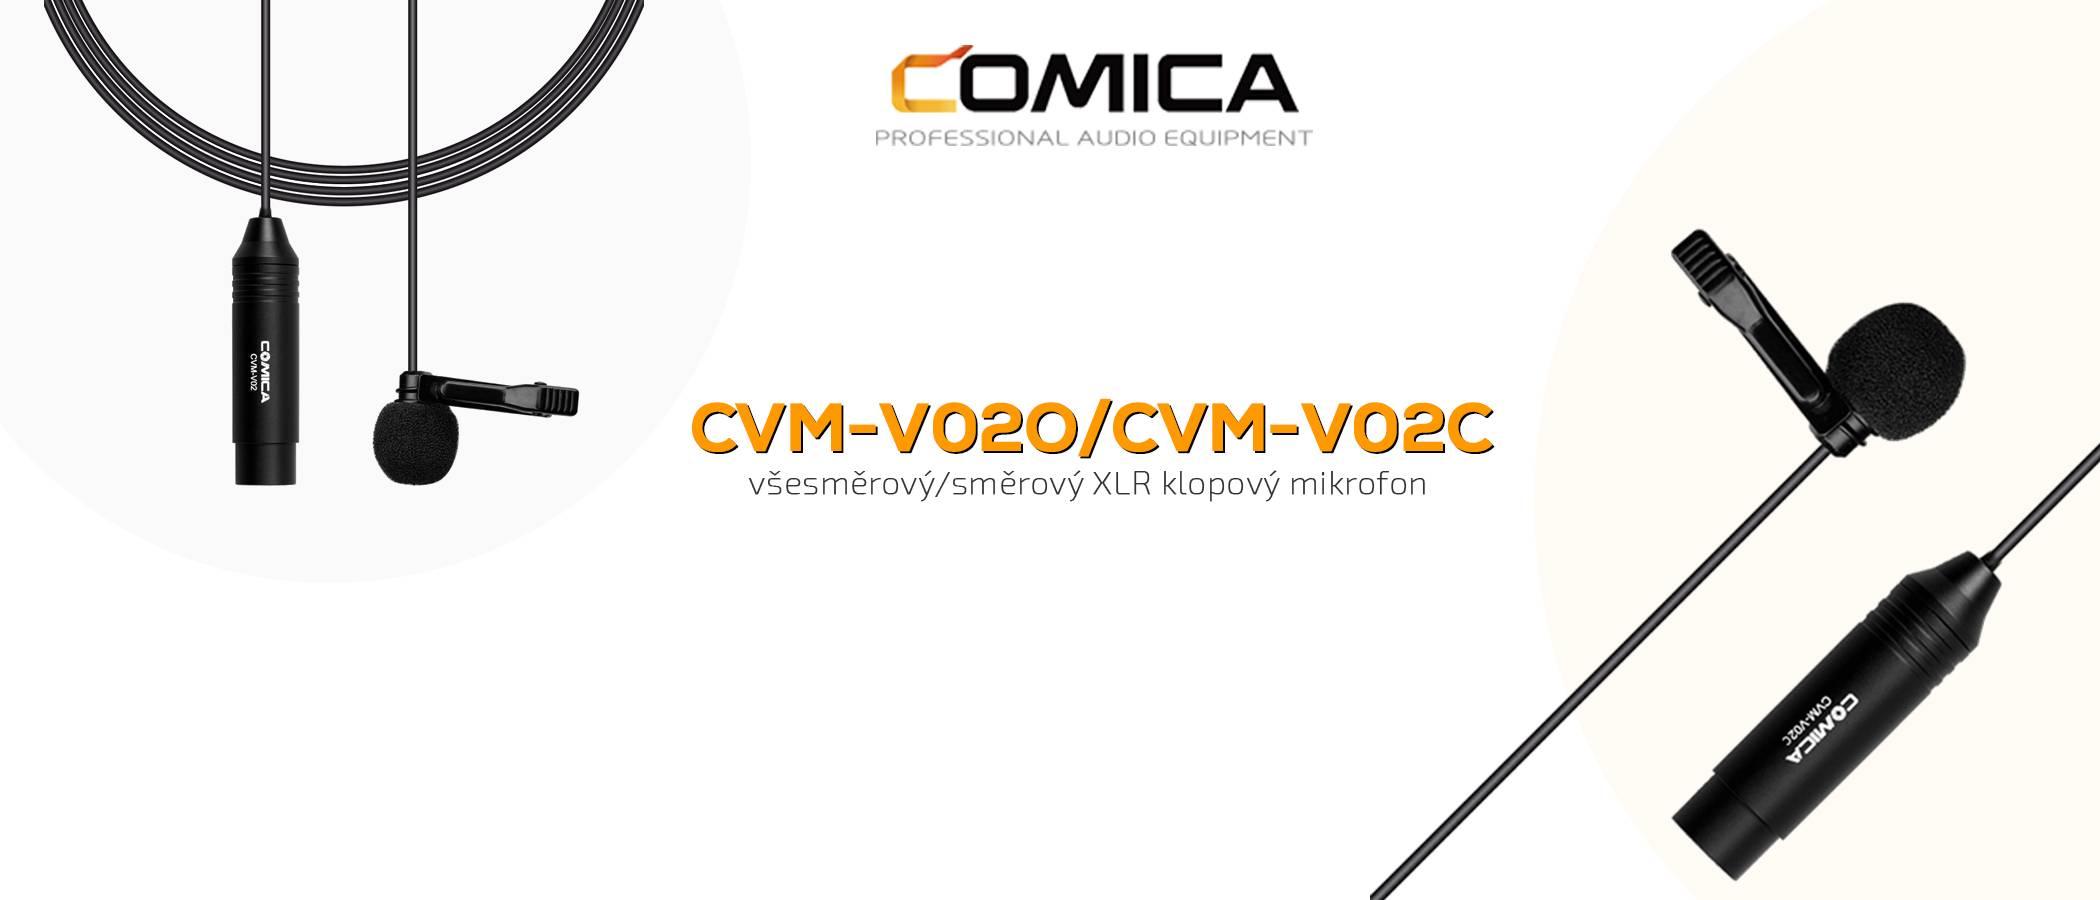 film-technika-camica-audio-xlr-cvm-v02o-vo2c